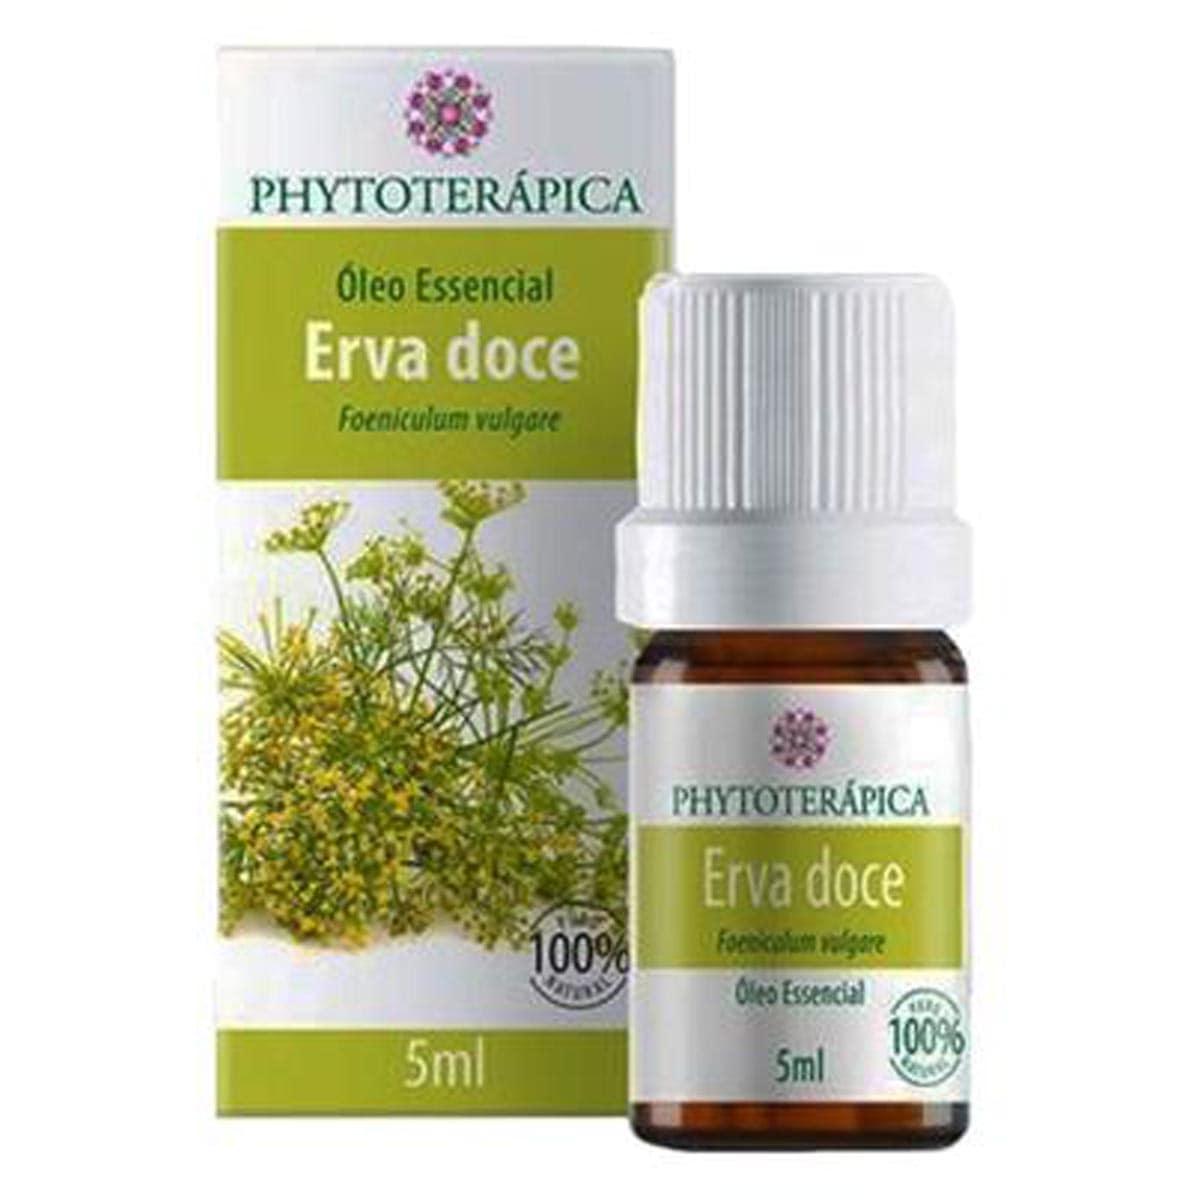 Oleo Essencial Erva Doce 5ml - Phytoterápica